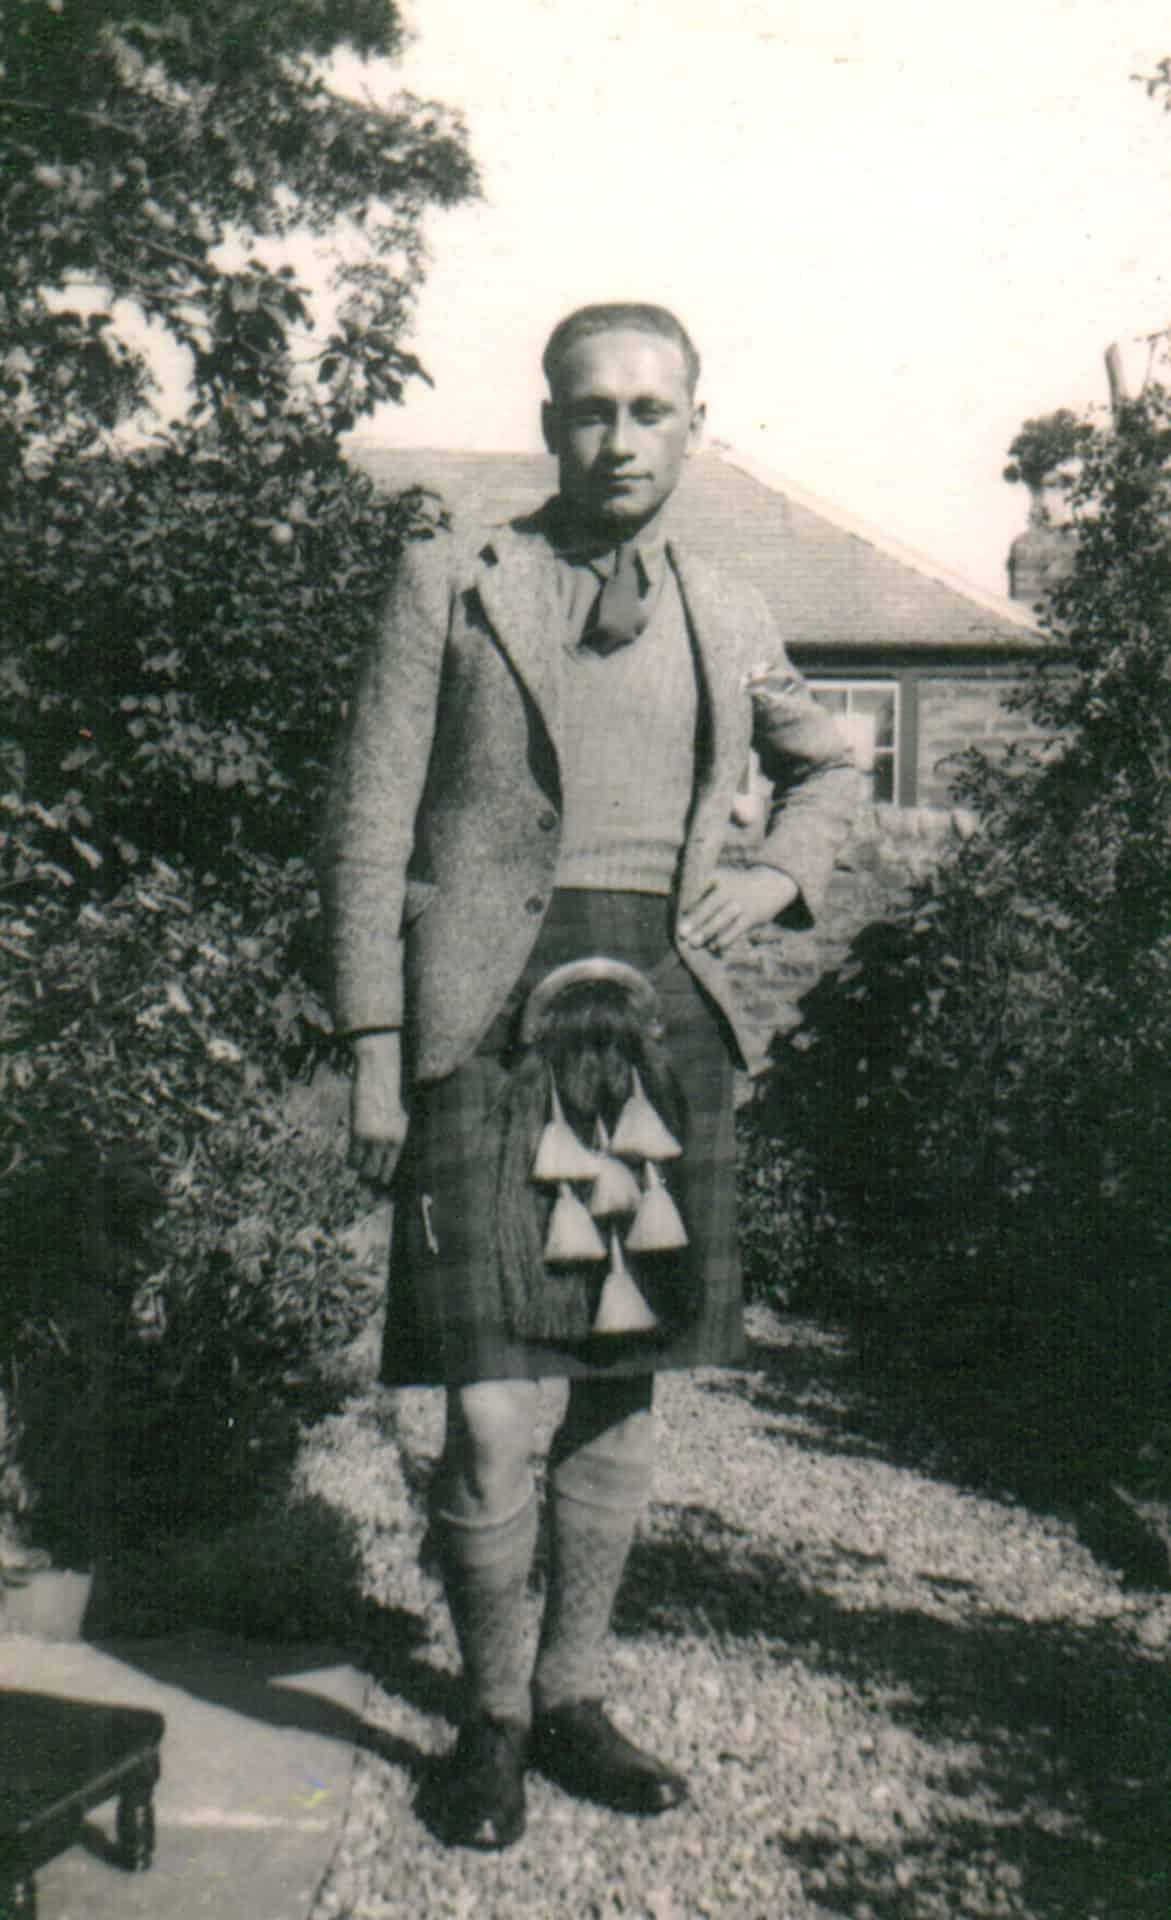 Scotland, 1942